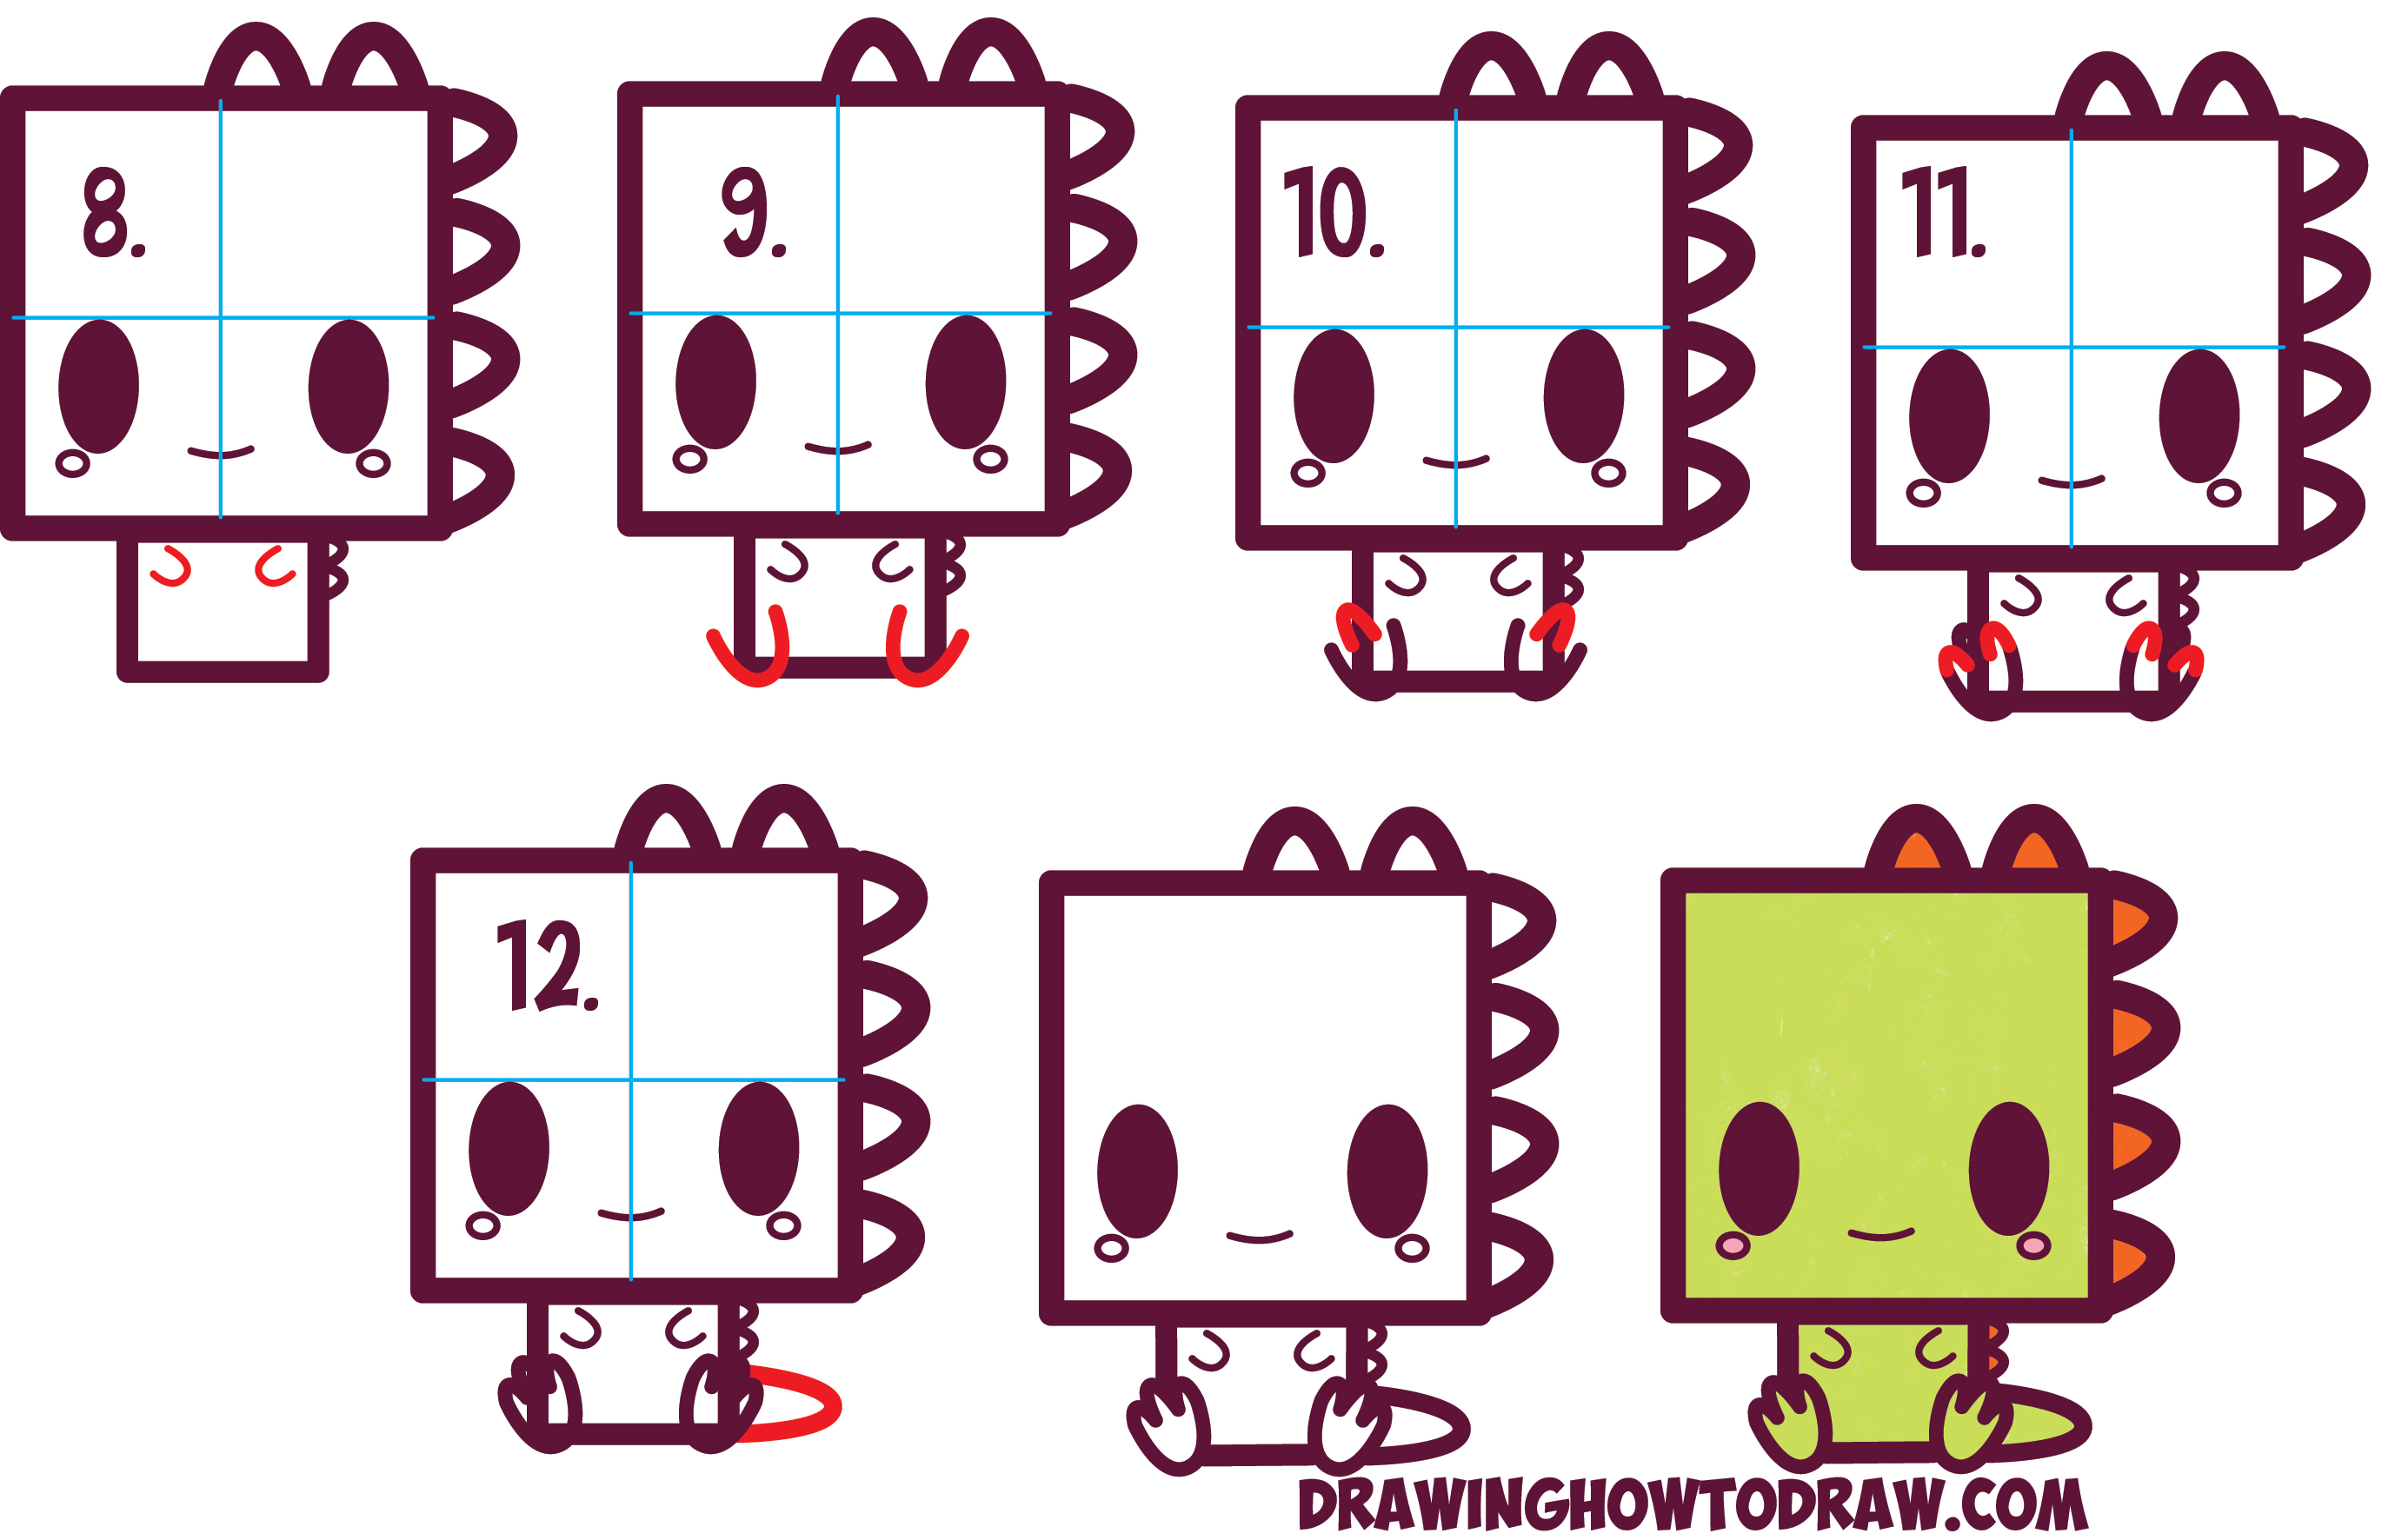 2755x1772 How To Draw Cute Kawaii Cartoon Baby Dinosaur From Squares